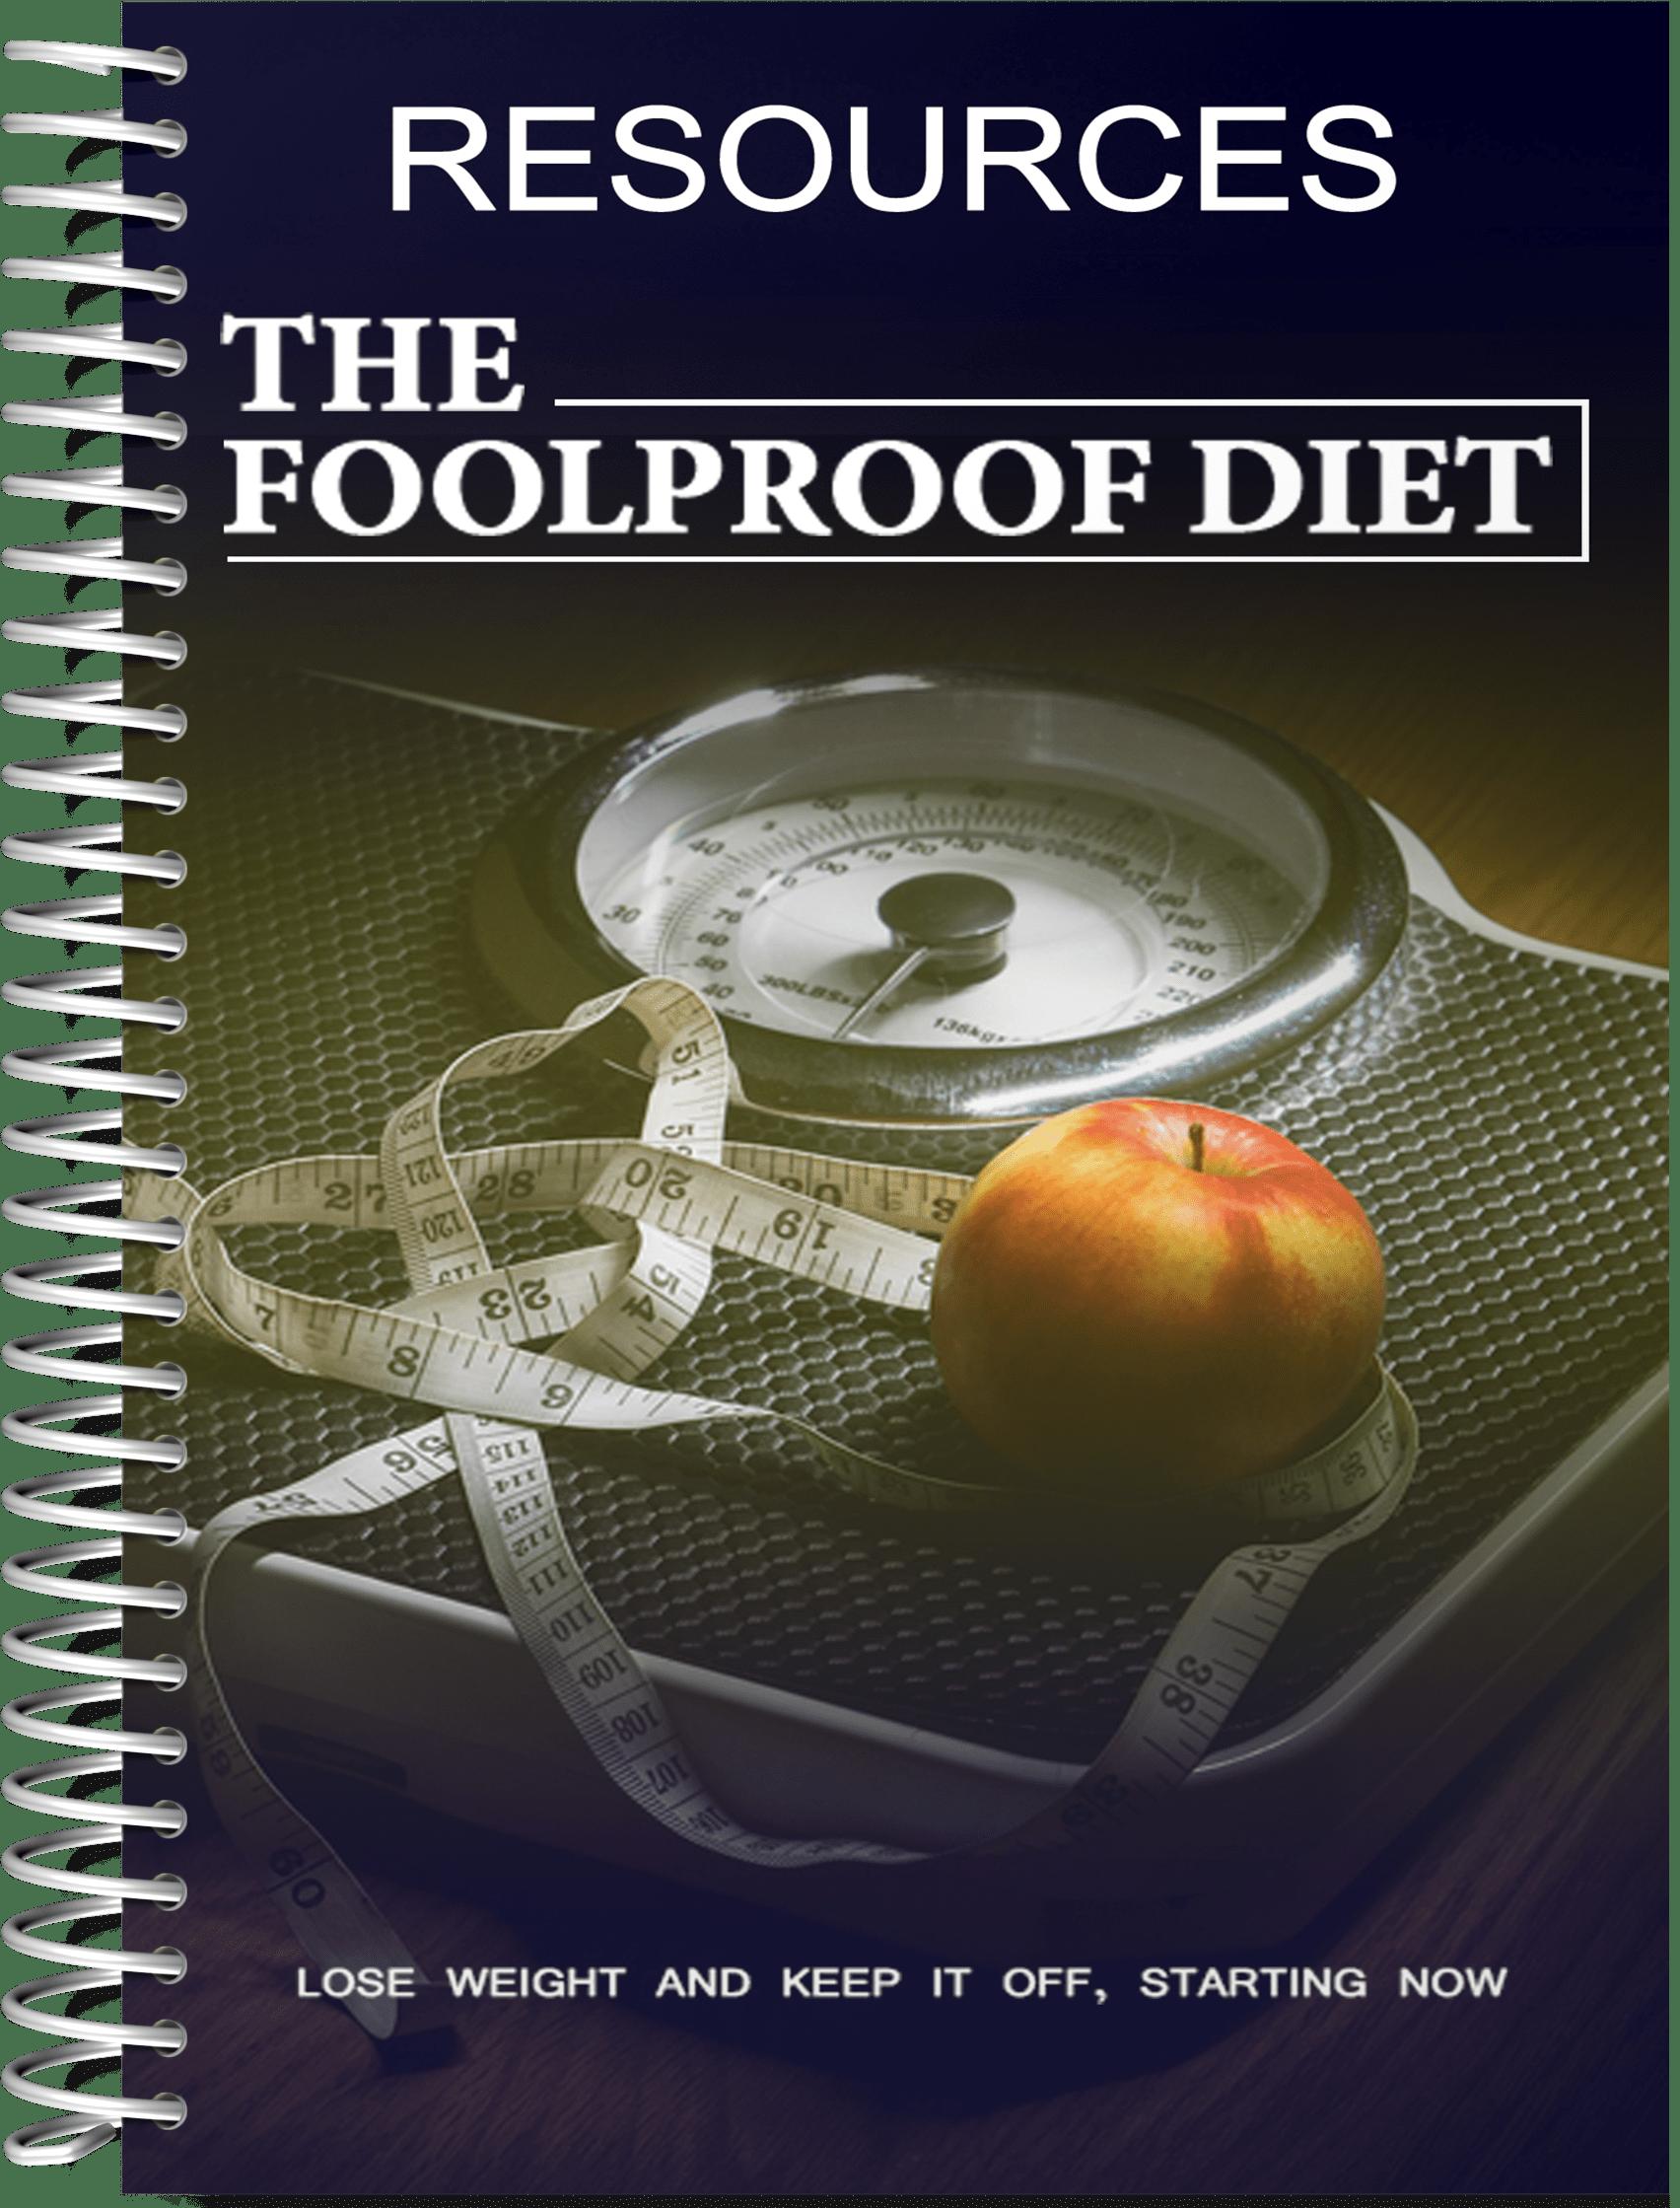 The Foolproof Diet